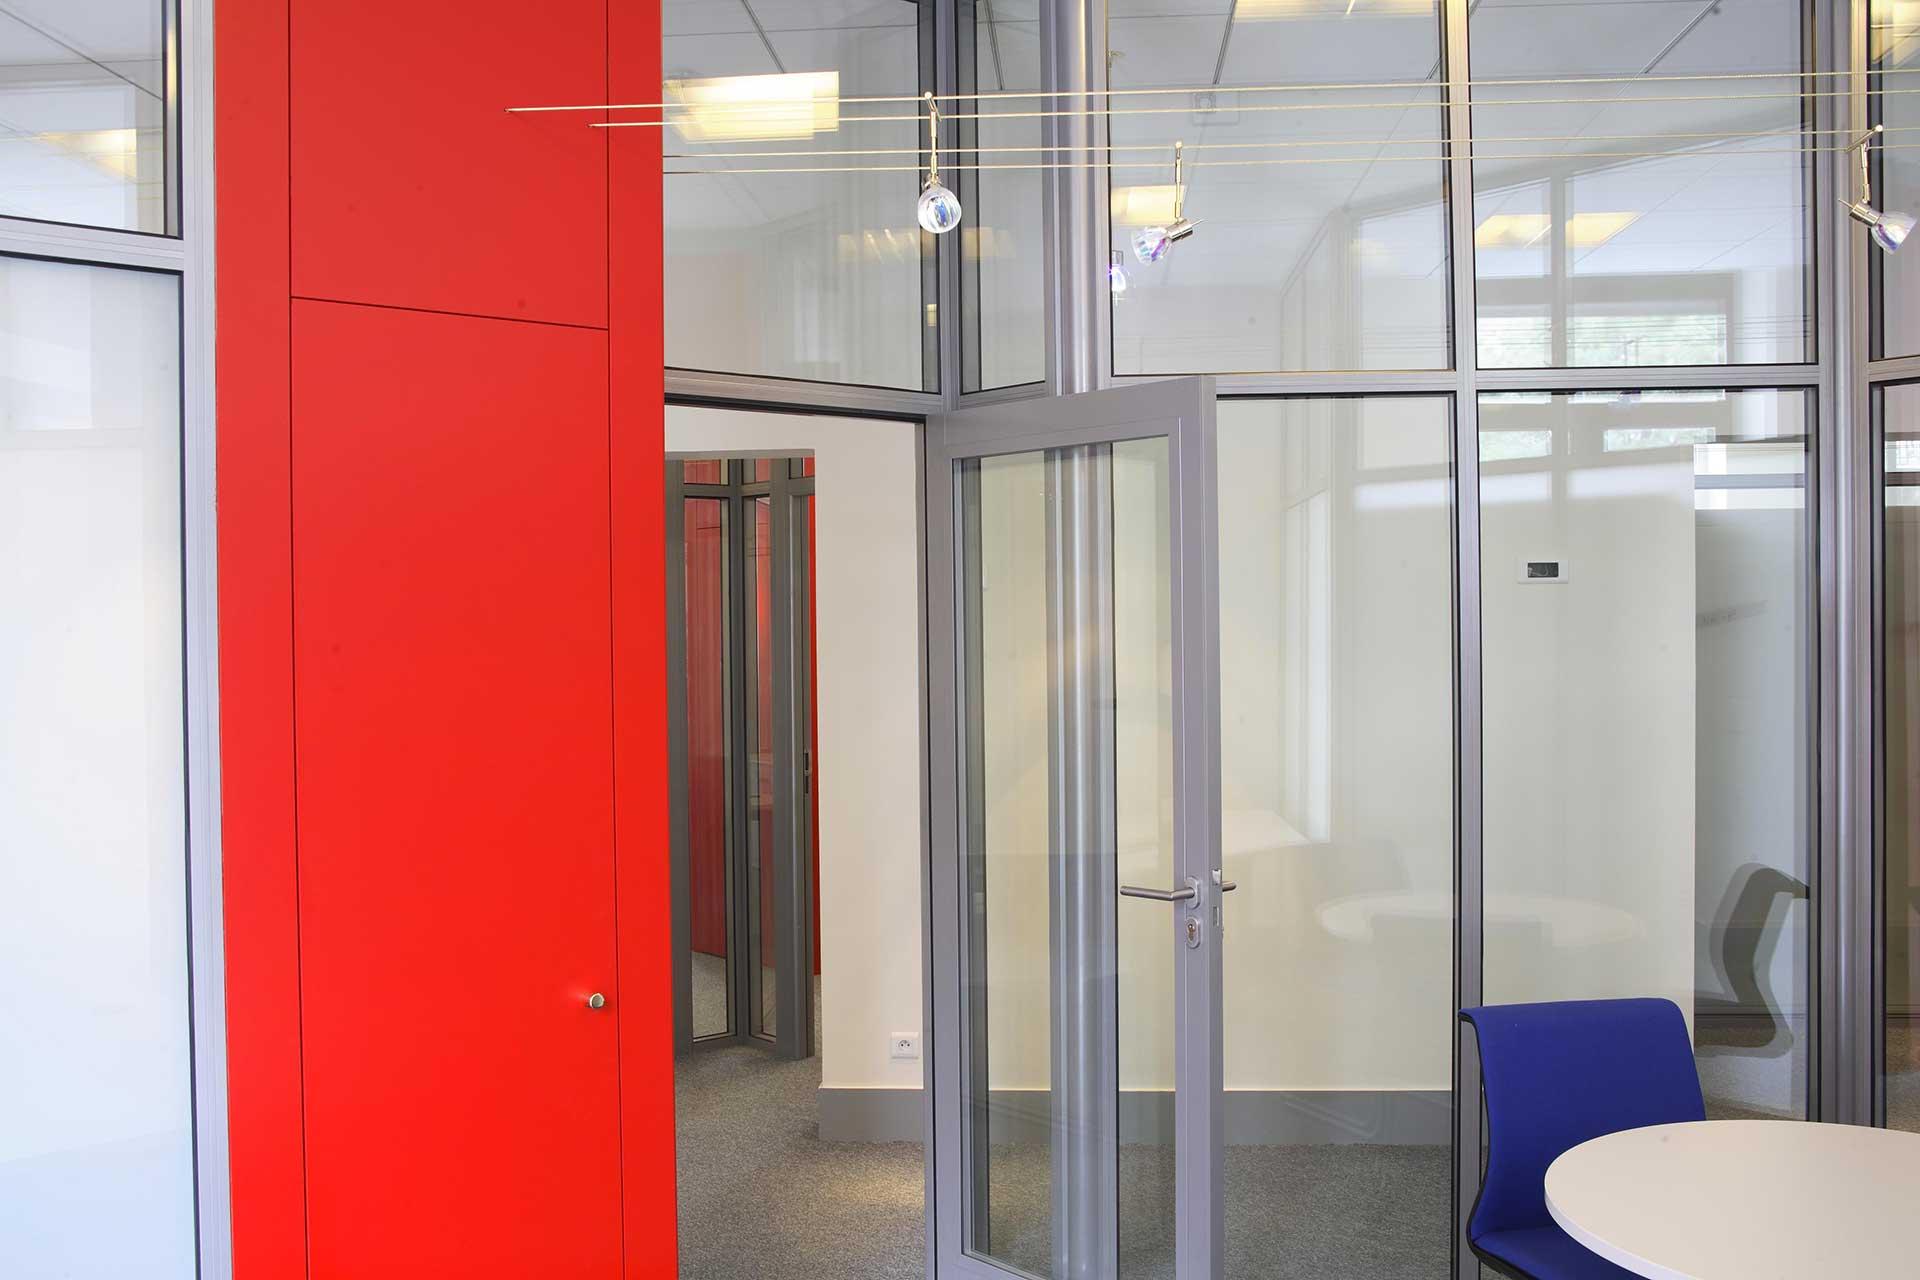 Cloisons amovibles blocs portes cadre aluminium ouvrant simple vantail